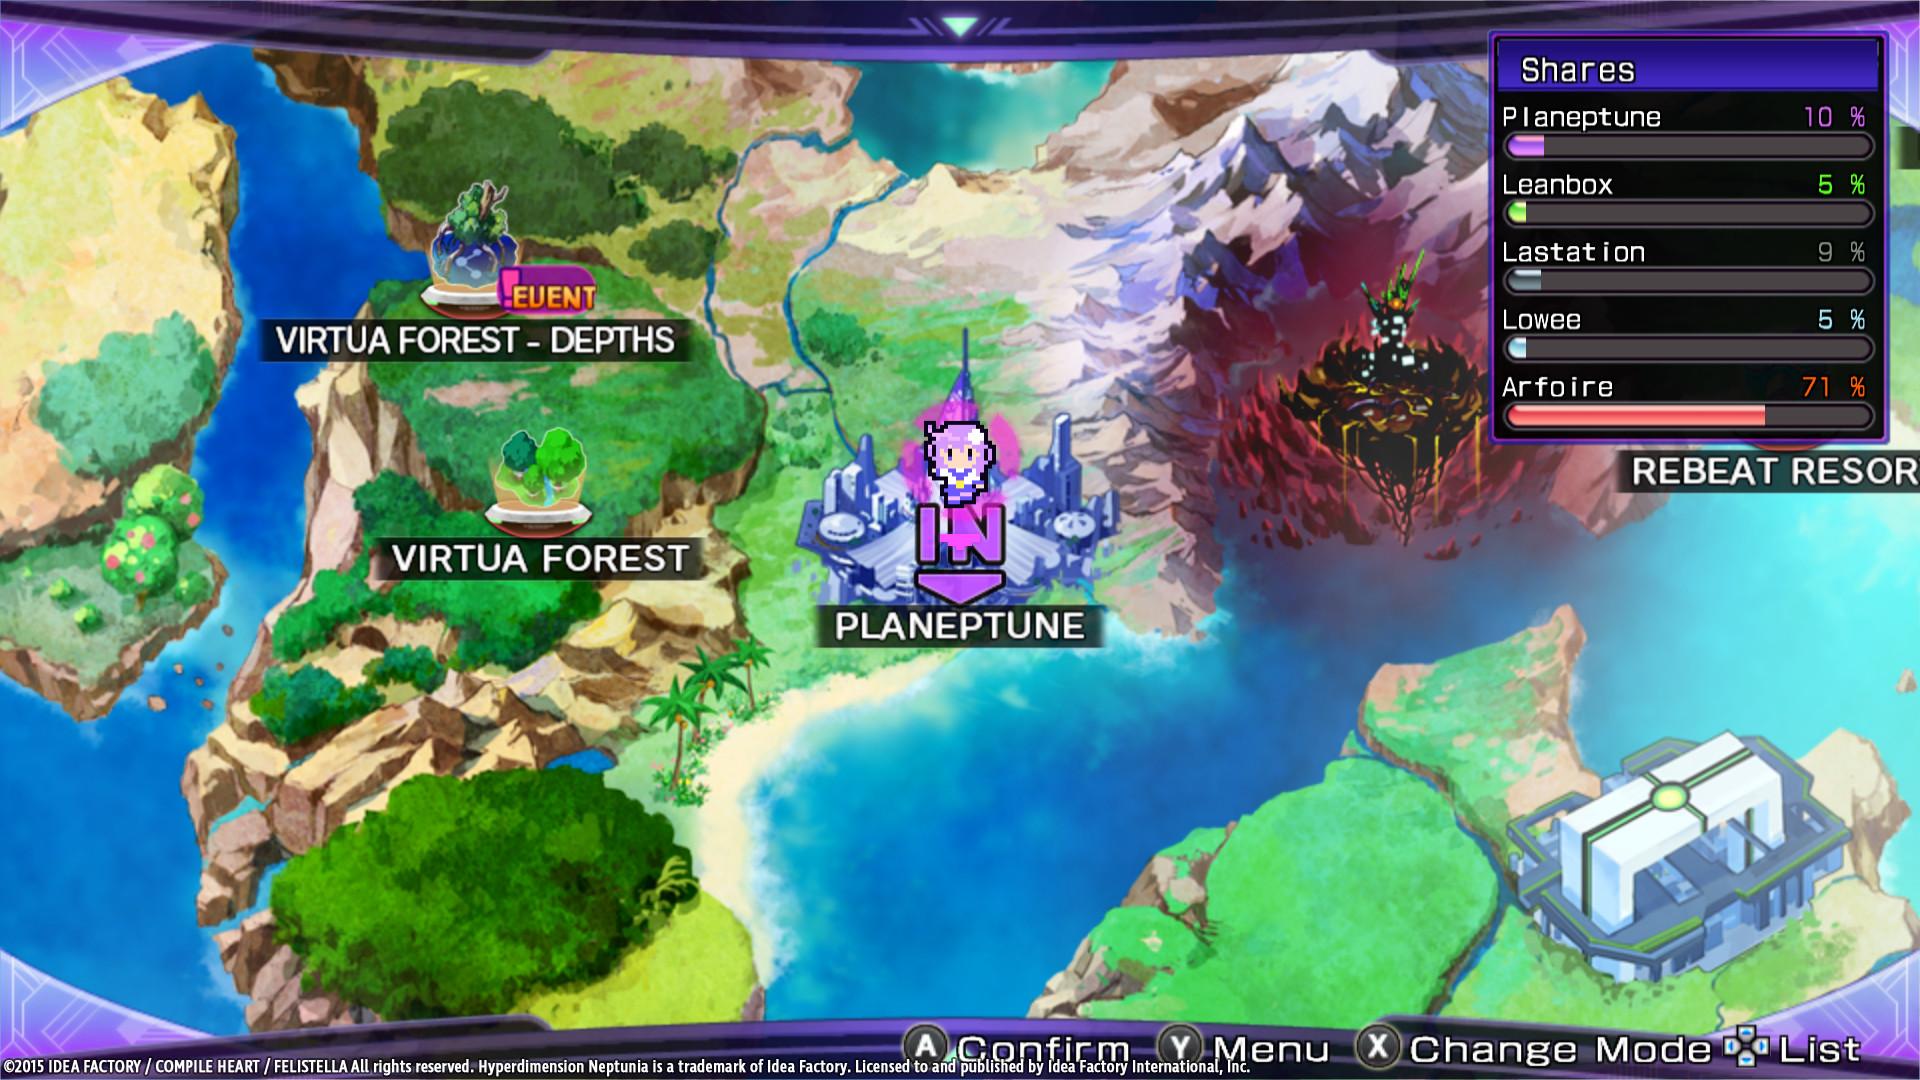 Hyperdimension Neptunia Re;Birth2 + DLC Steam Key 2019